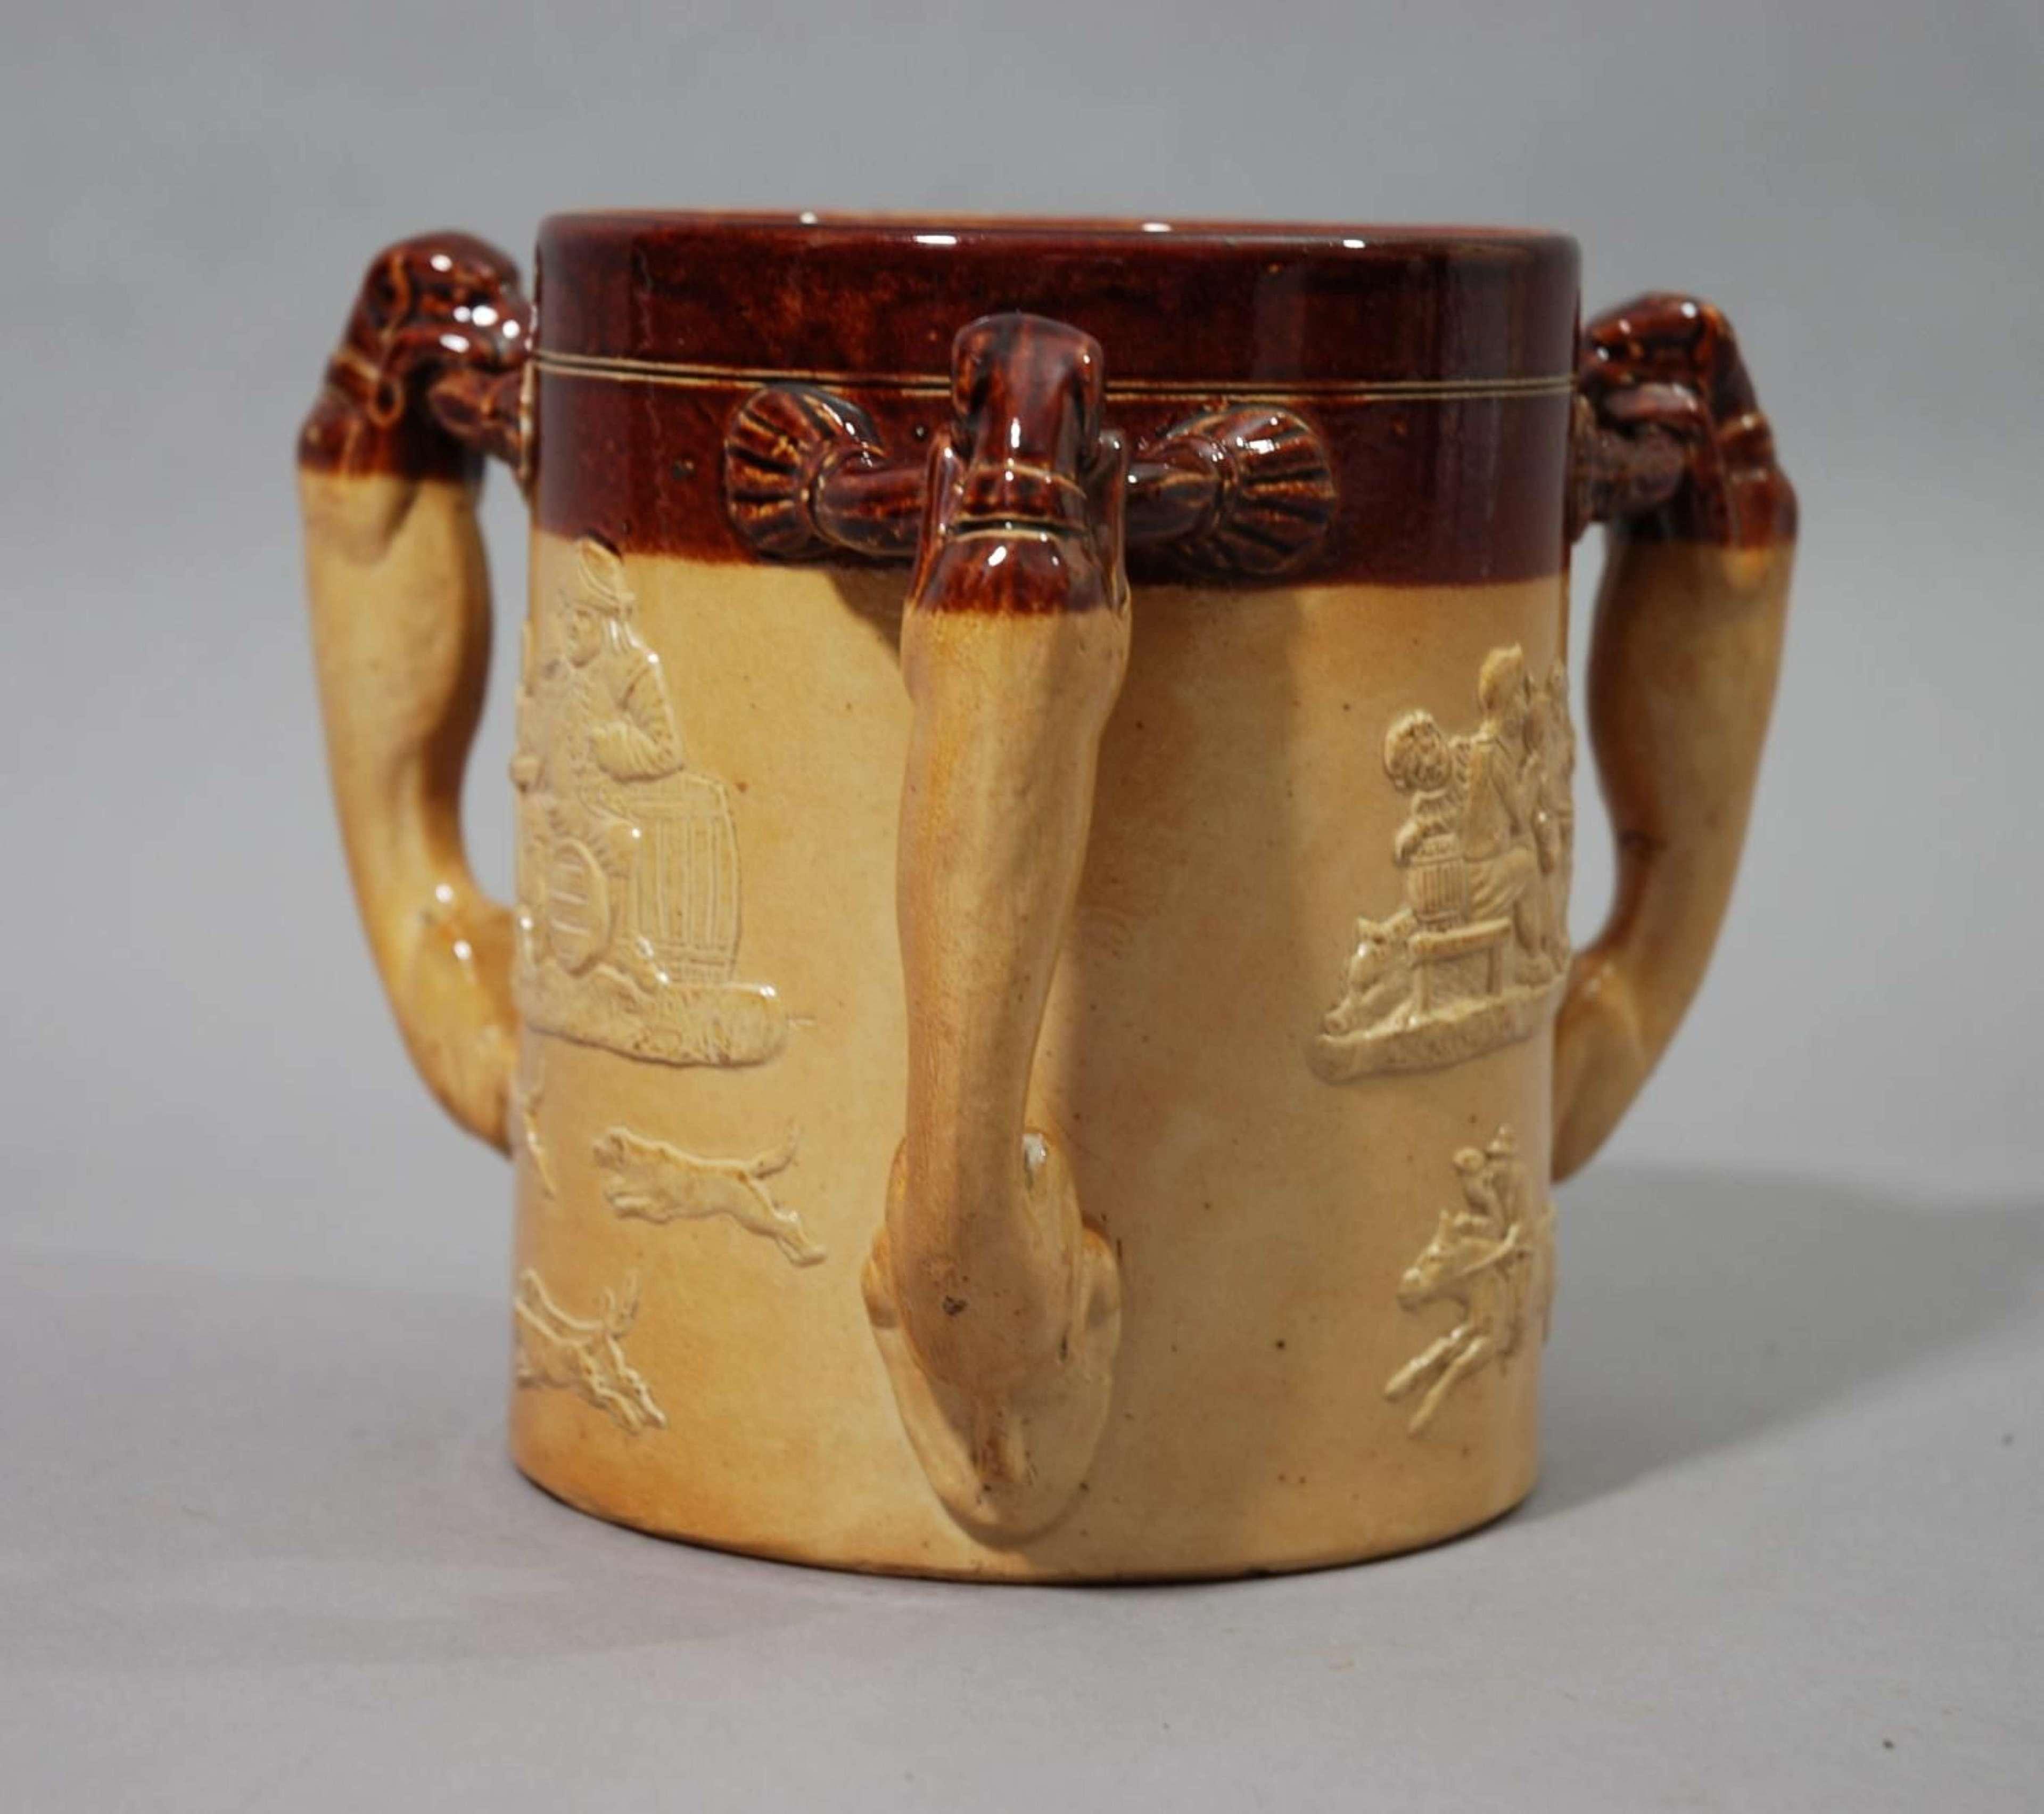 Royal Doulton Lambeth stoneware tyg